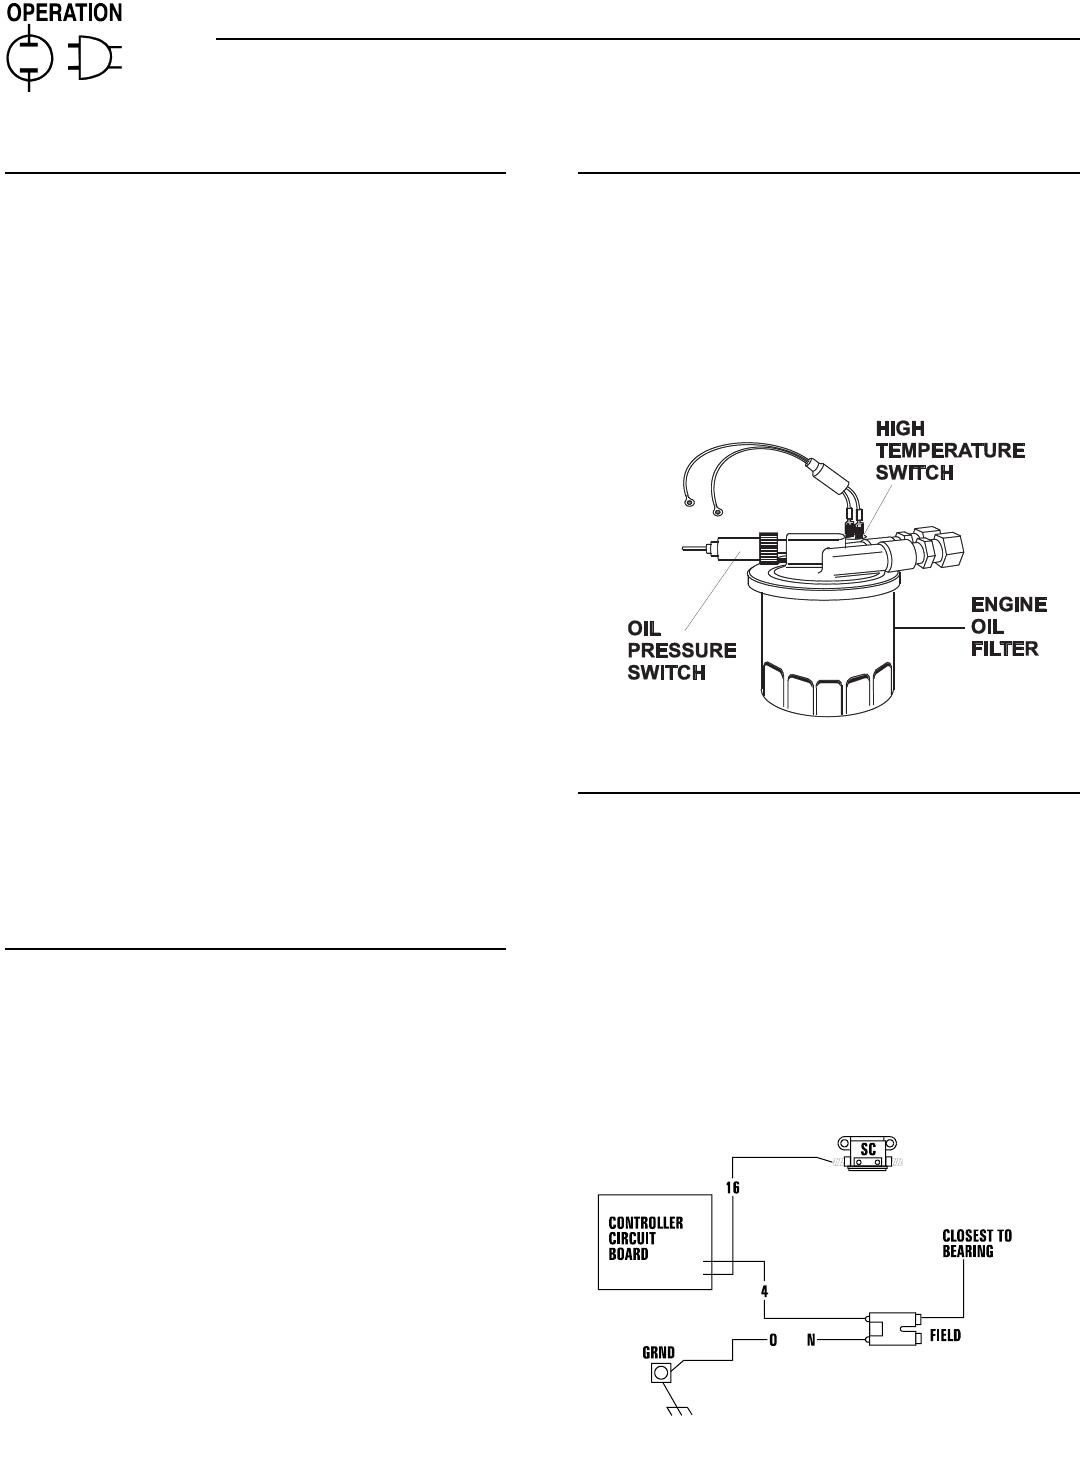 Generac 004702 0 004703 004704 004705 004706 004707 Owners Manual Wiring Field 10 Generacpower Systems Inc